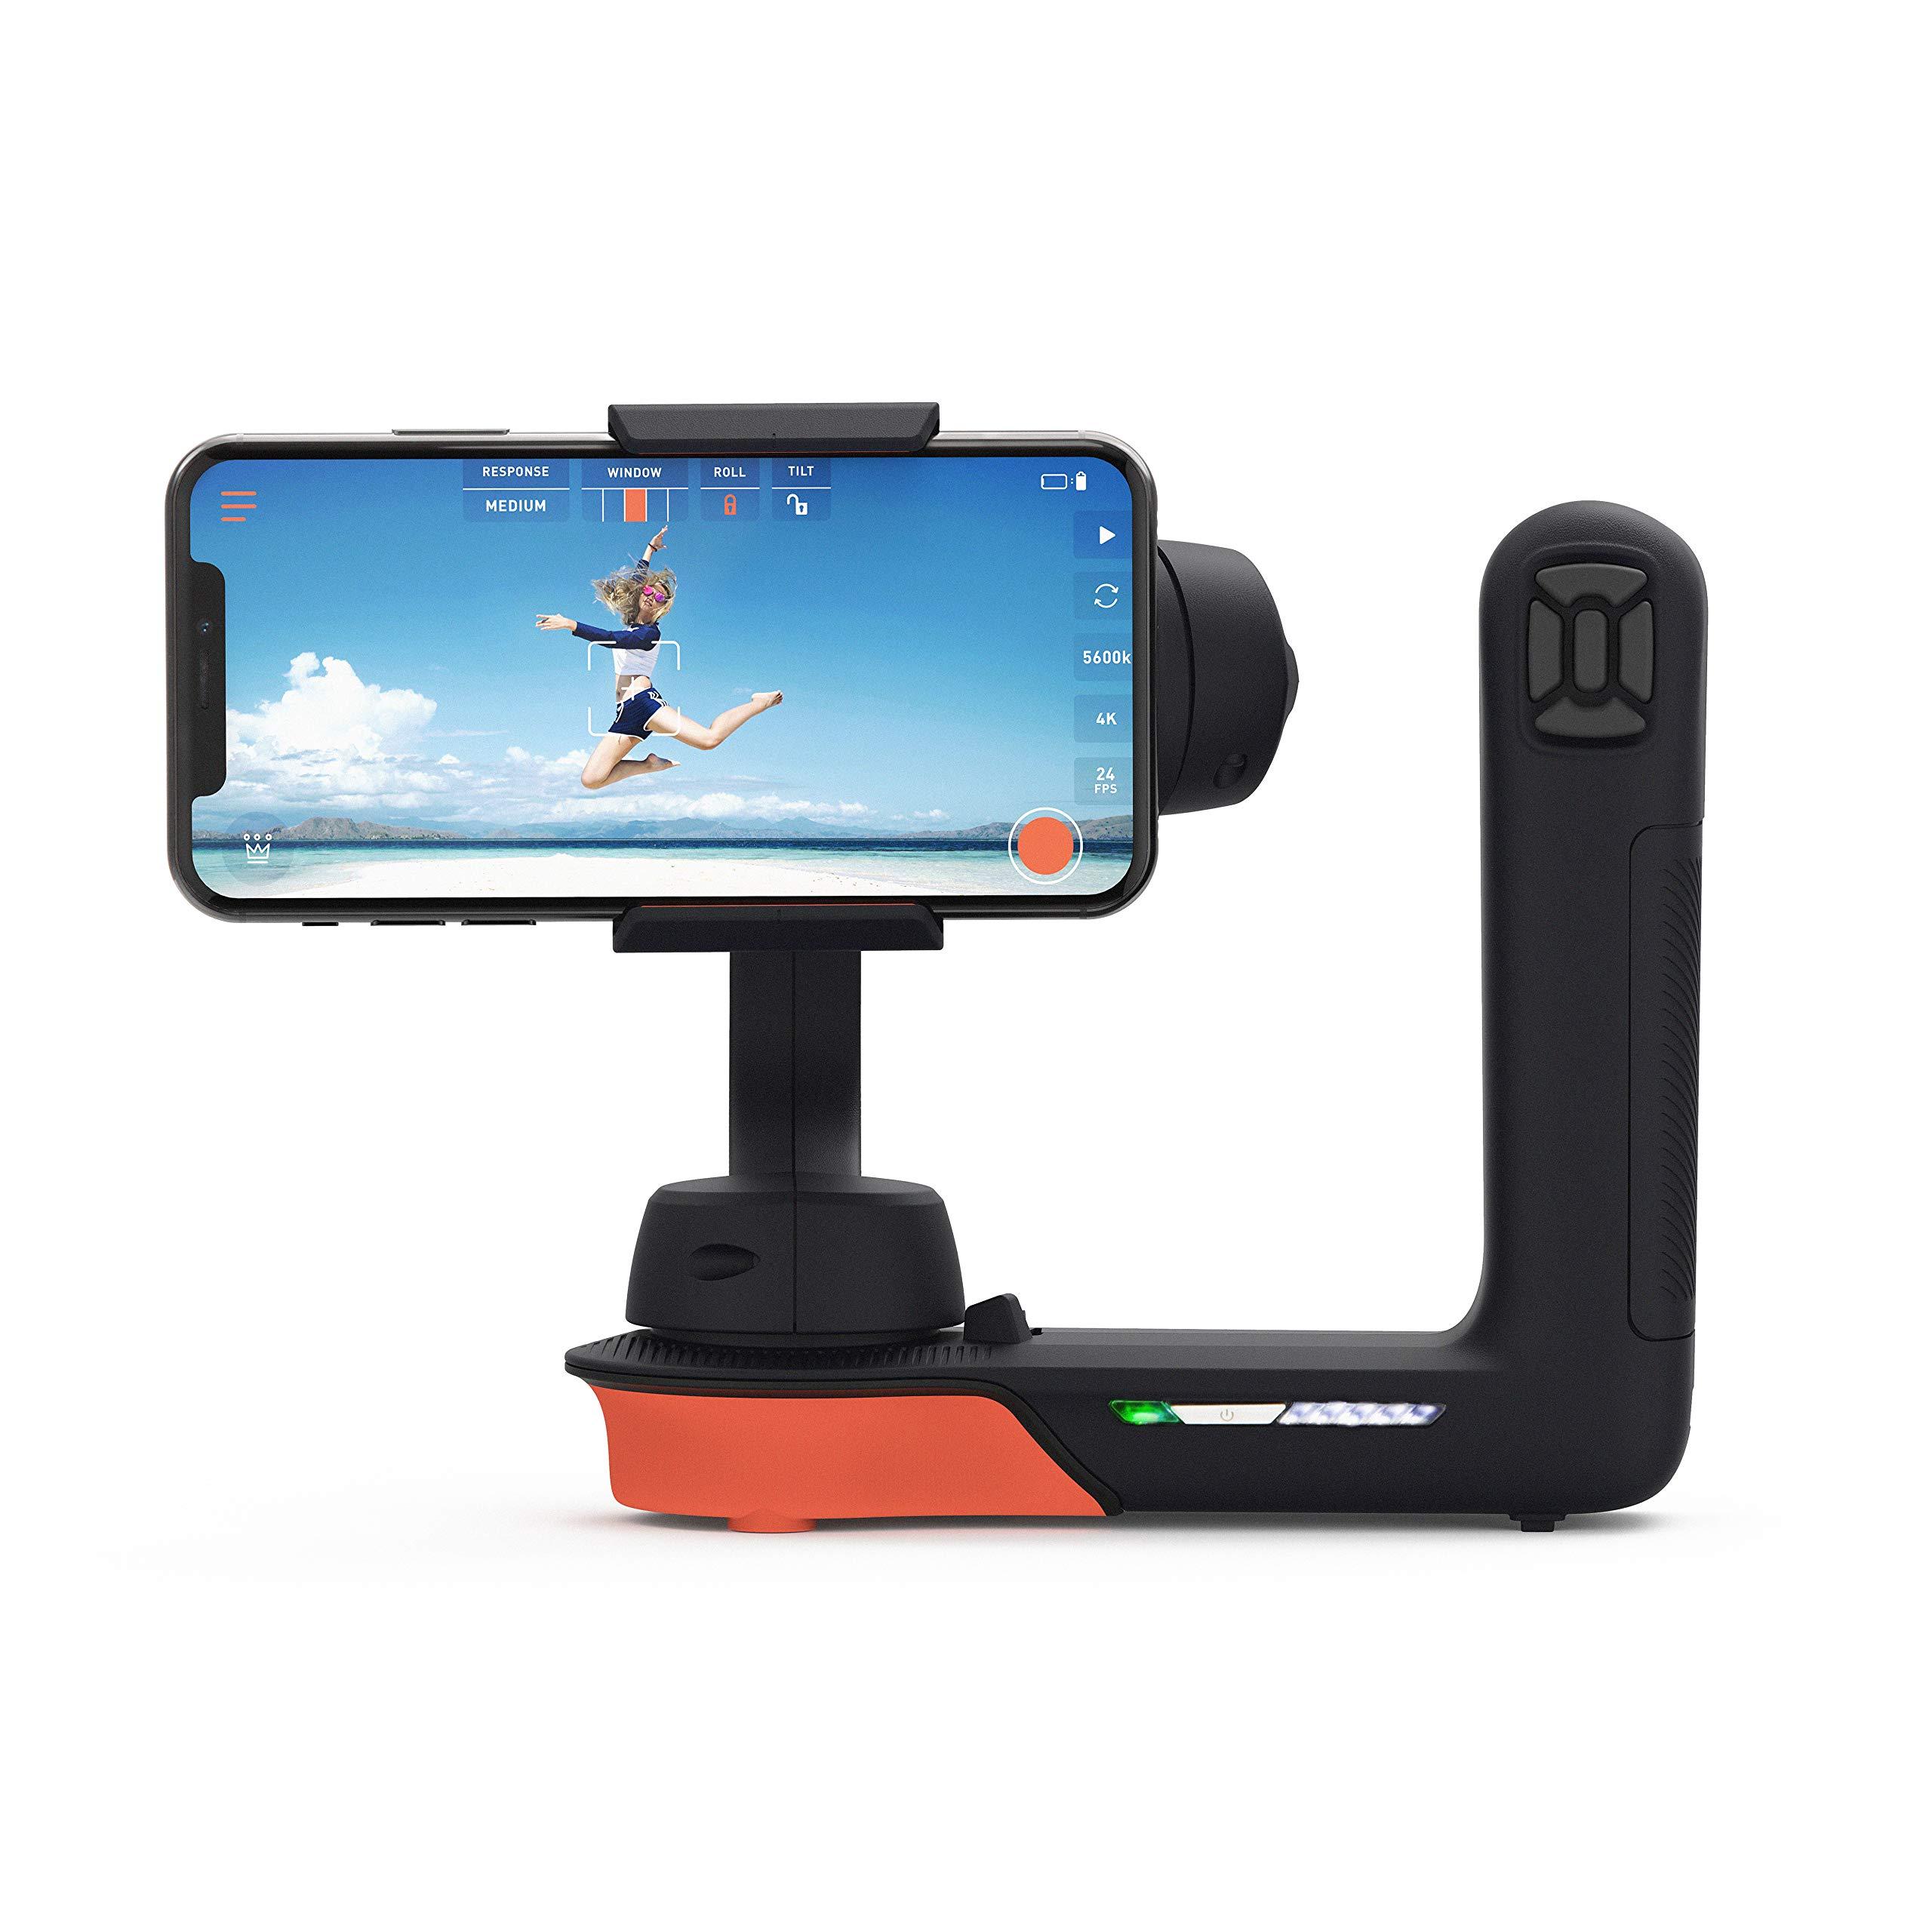 ویکالا · خرید  اصل اورجینال · خرید از آمازون · Freefly Movi Cinema Robot Smartphone Stabilizer wekala · ویکالا